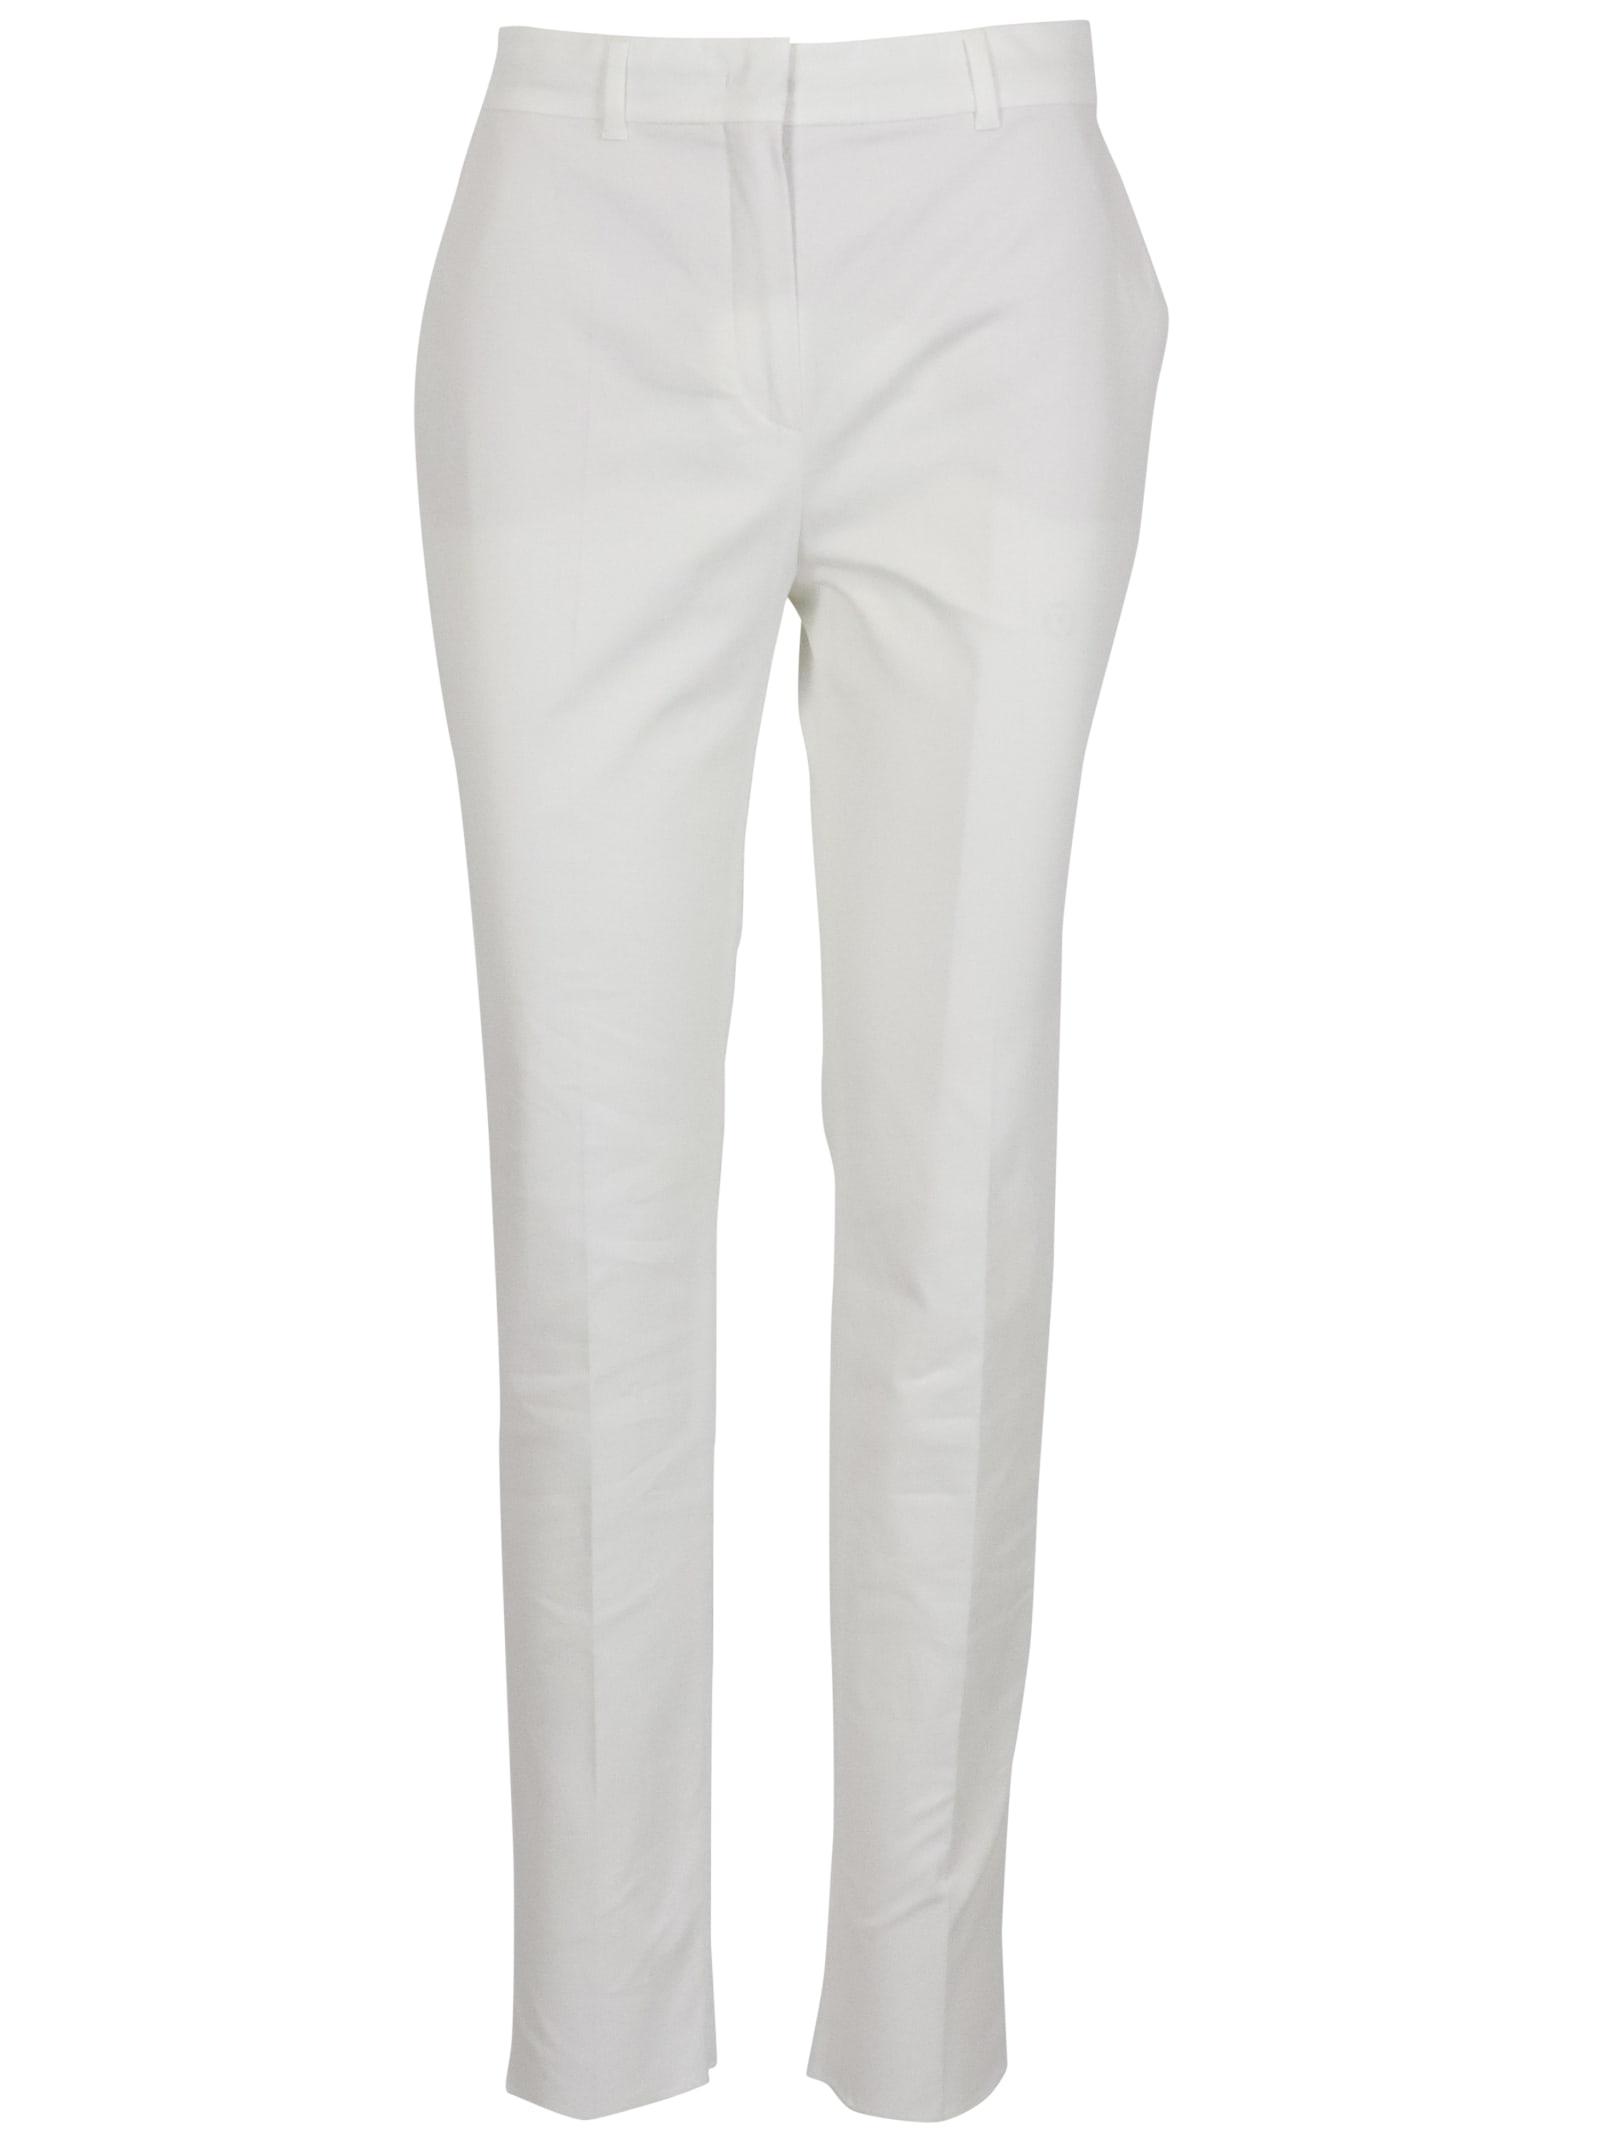 Nichel Trousers